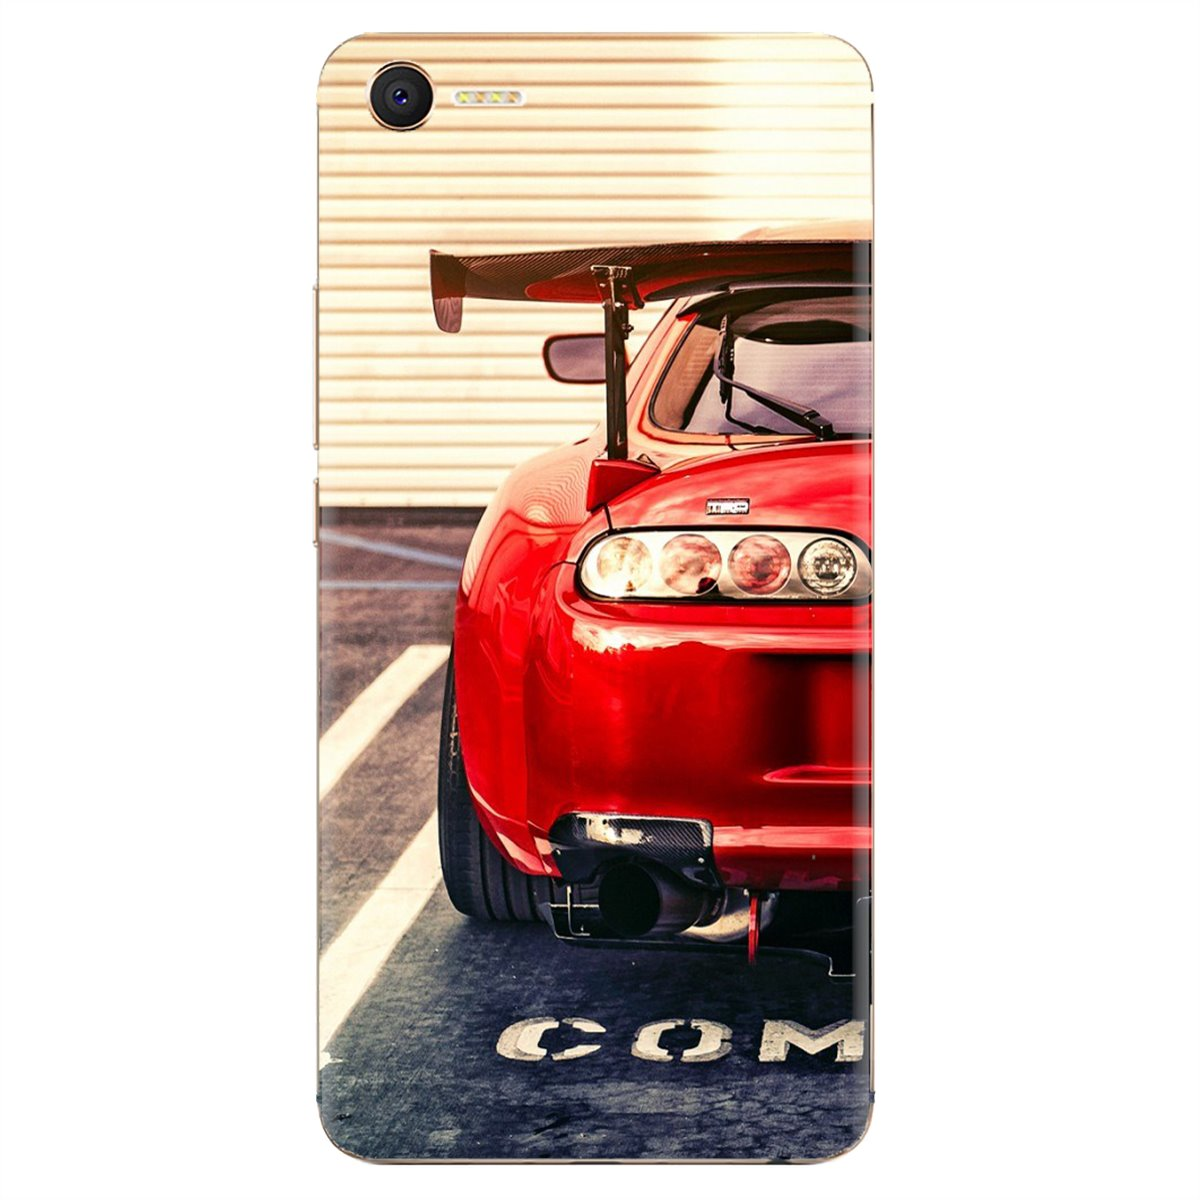 Suave de la cubierta del TPU del impresionante Super coches coche rojo sintonizado supra para Samsung Galaxy A10 A30 A40 A50 A60 A70 S6 activo Nota 10 Plus M30